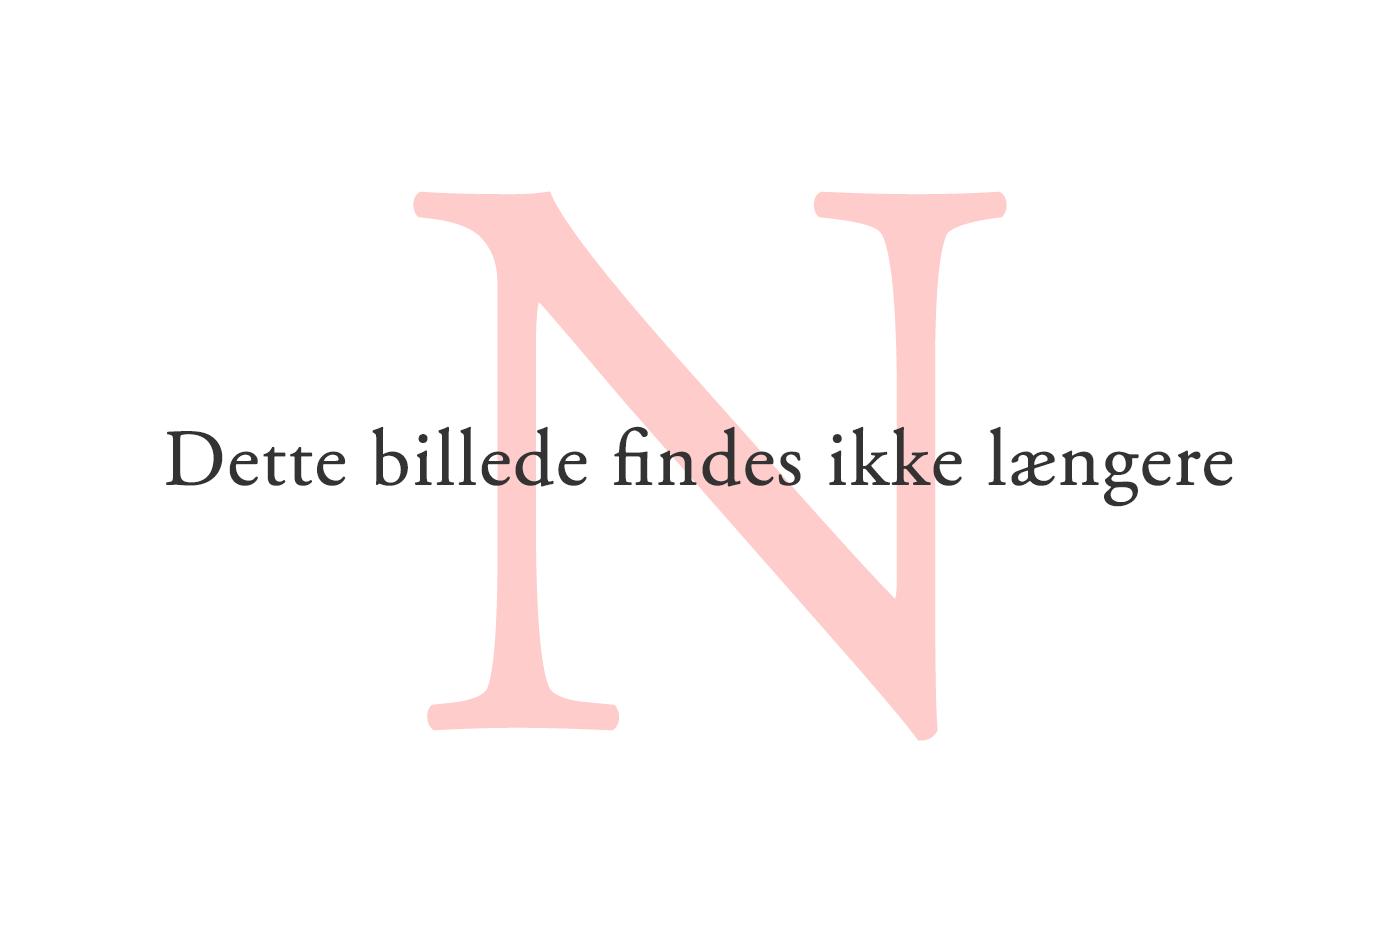 Data: Data: Danske Medier Research / Gemius